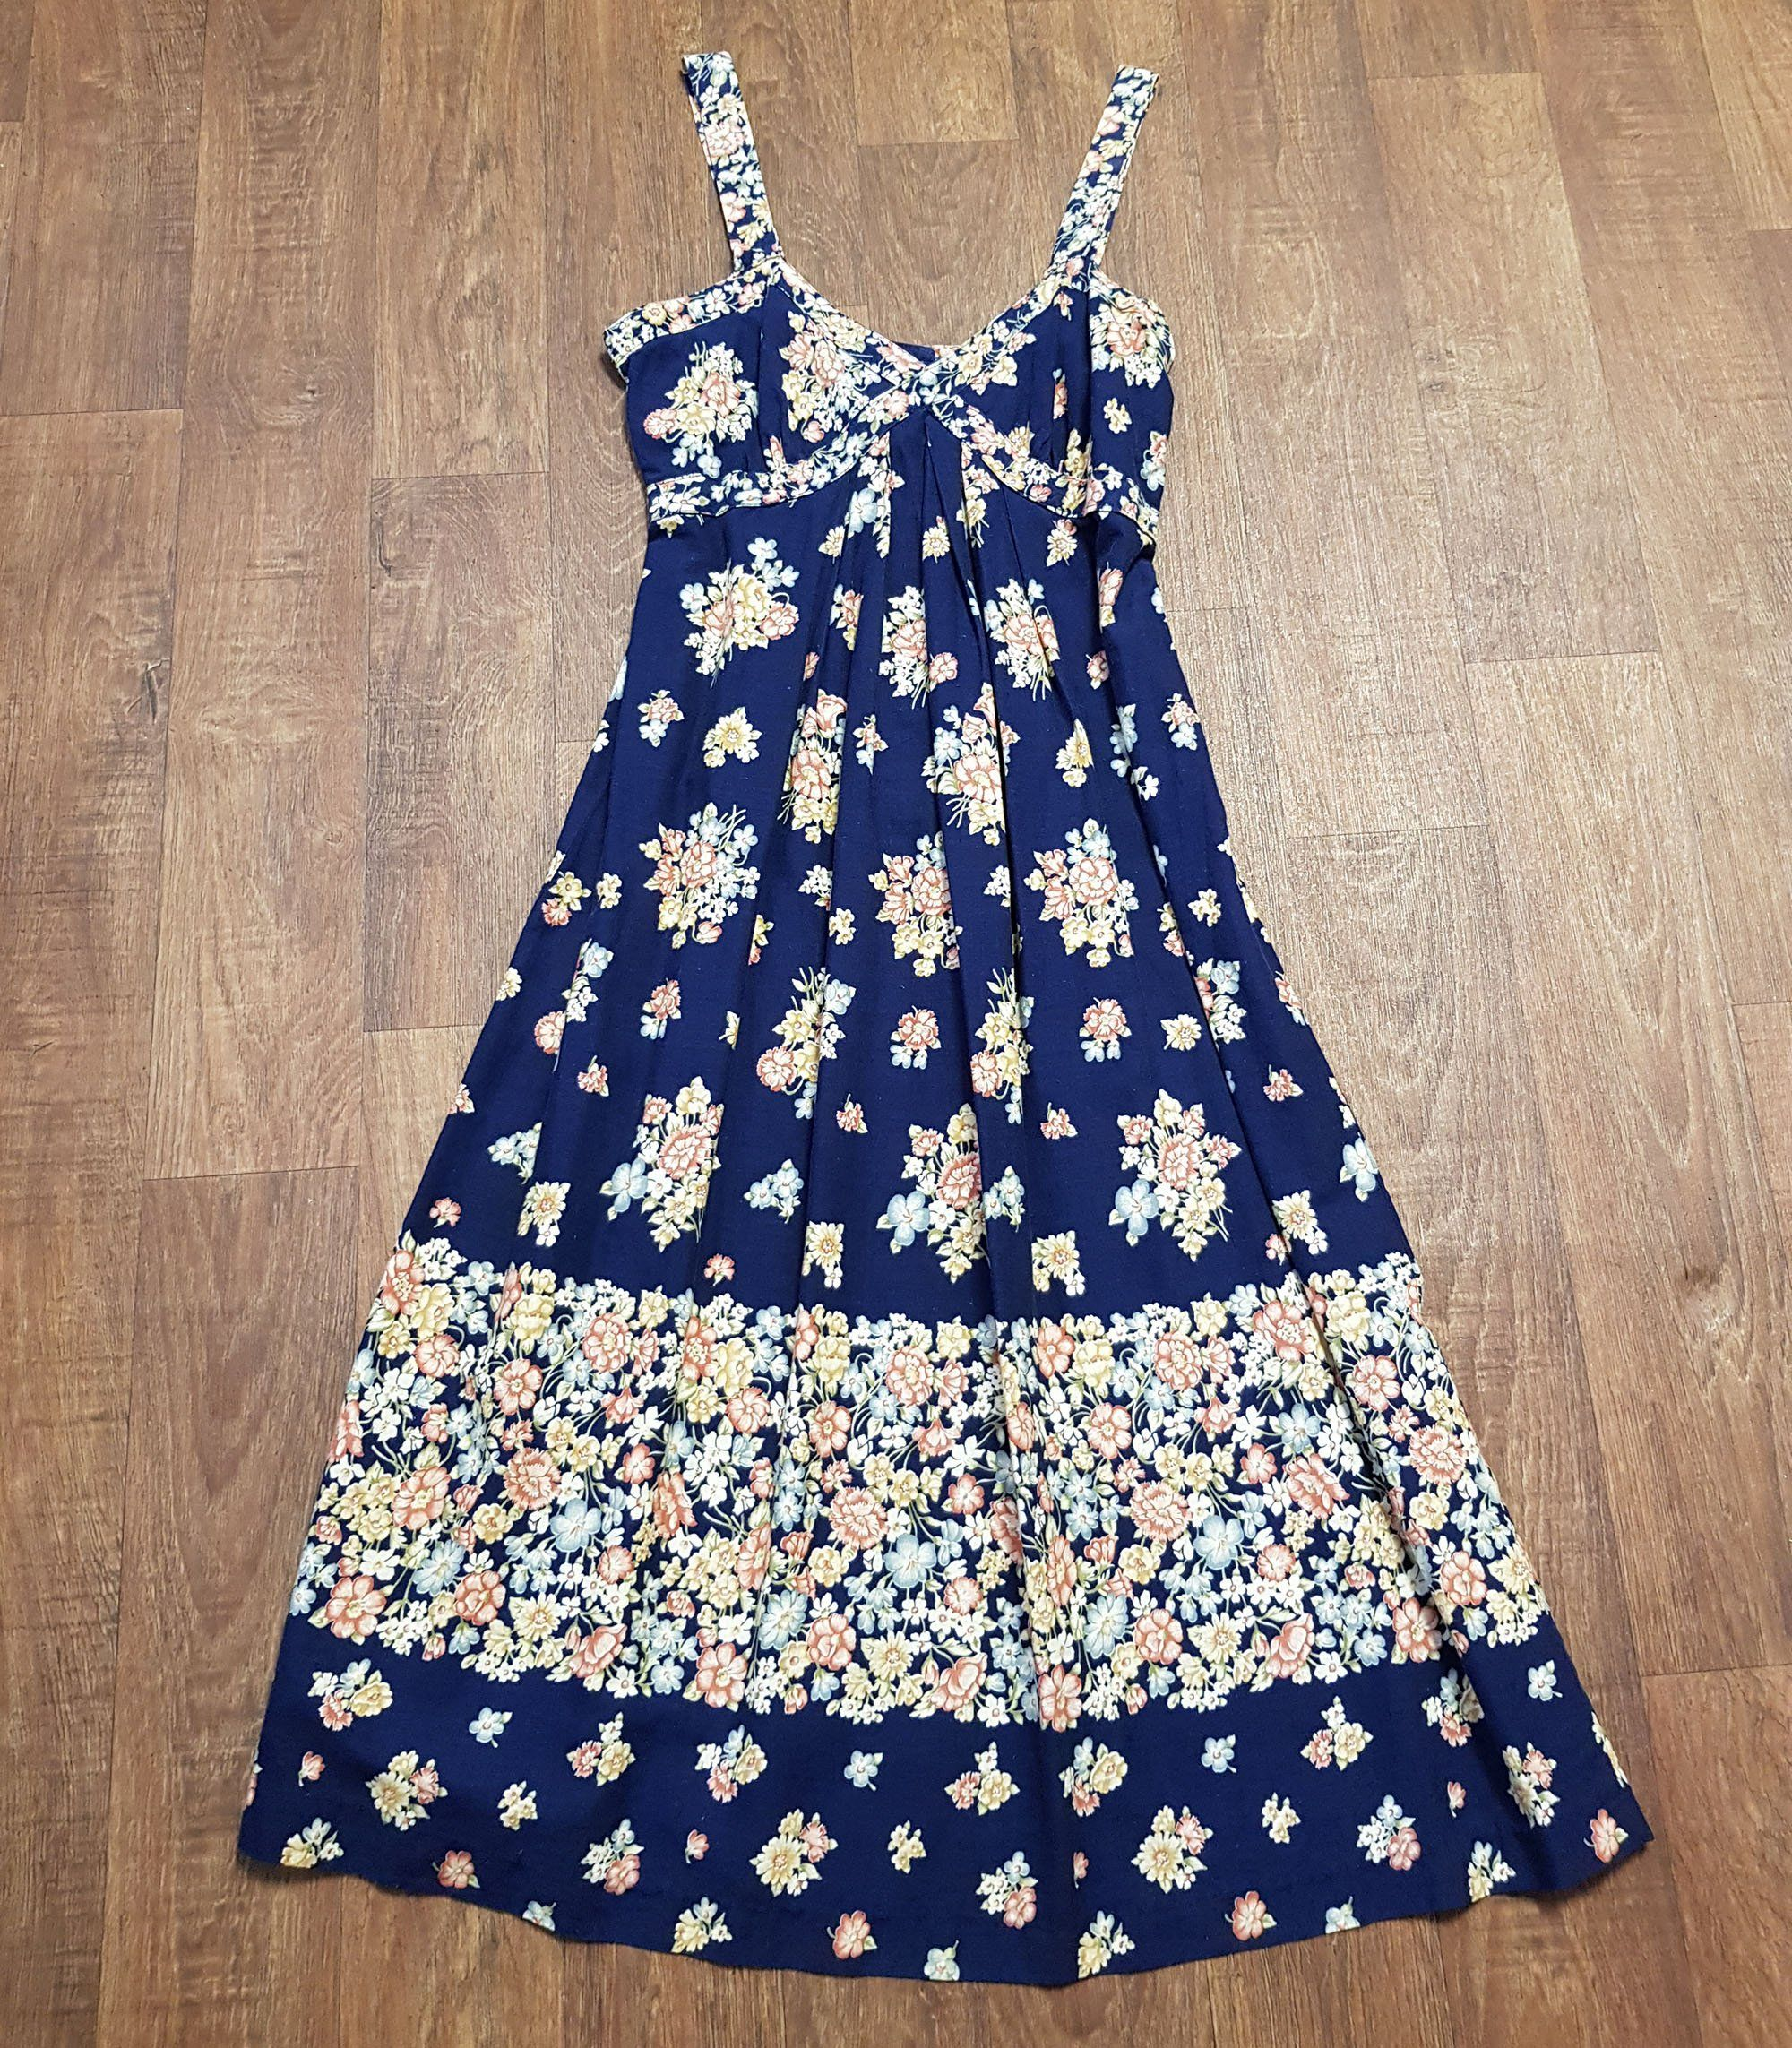 1980s Vintage Navy Rose Print Sun Dress Uk Size 10 12 Vintage Dresses In 2020 Vintage Sun Dress Sun Dresses Uk Vintage Dresses